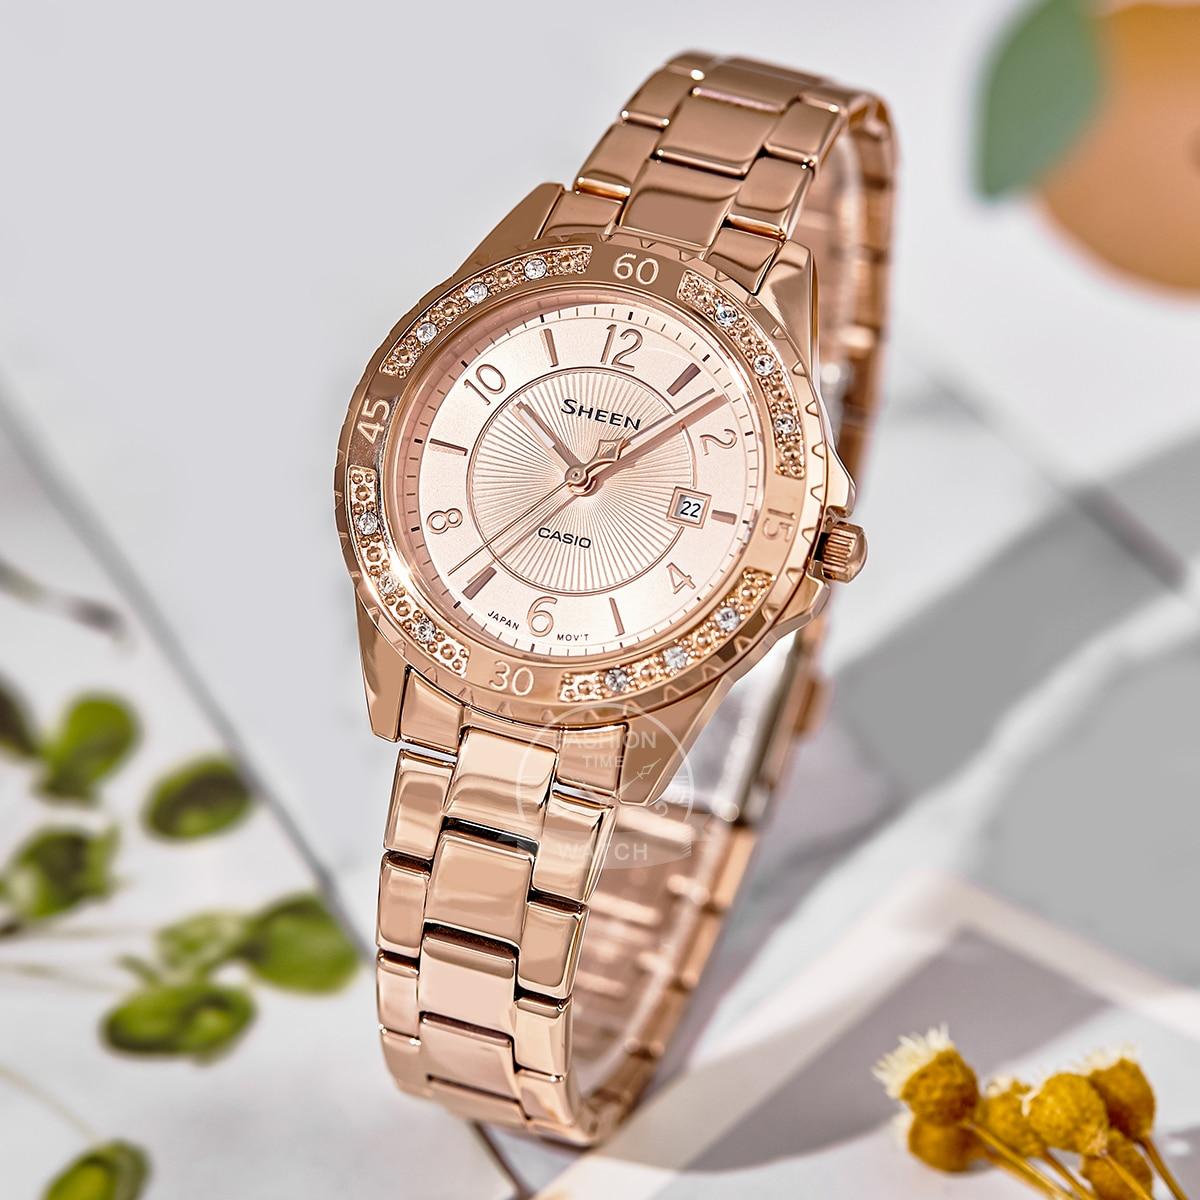 Casio watch ladies luxury  Swarovski diamond sapphire glass Rose women watch girl  watch 50m waterproof quartz relogio SHE4532PG enlarge